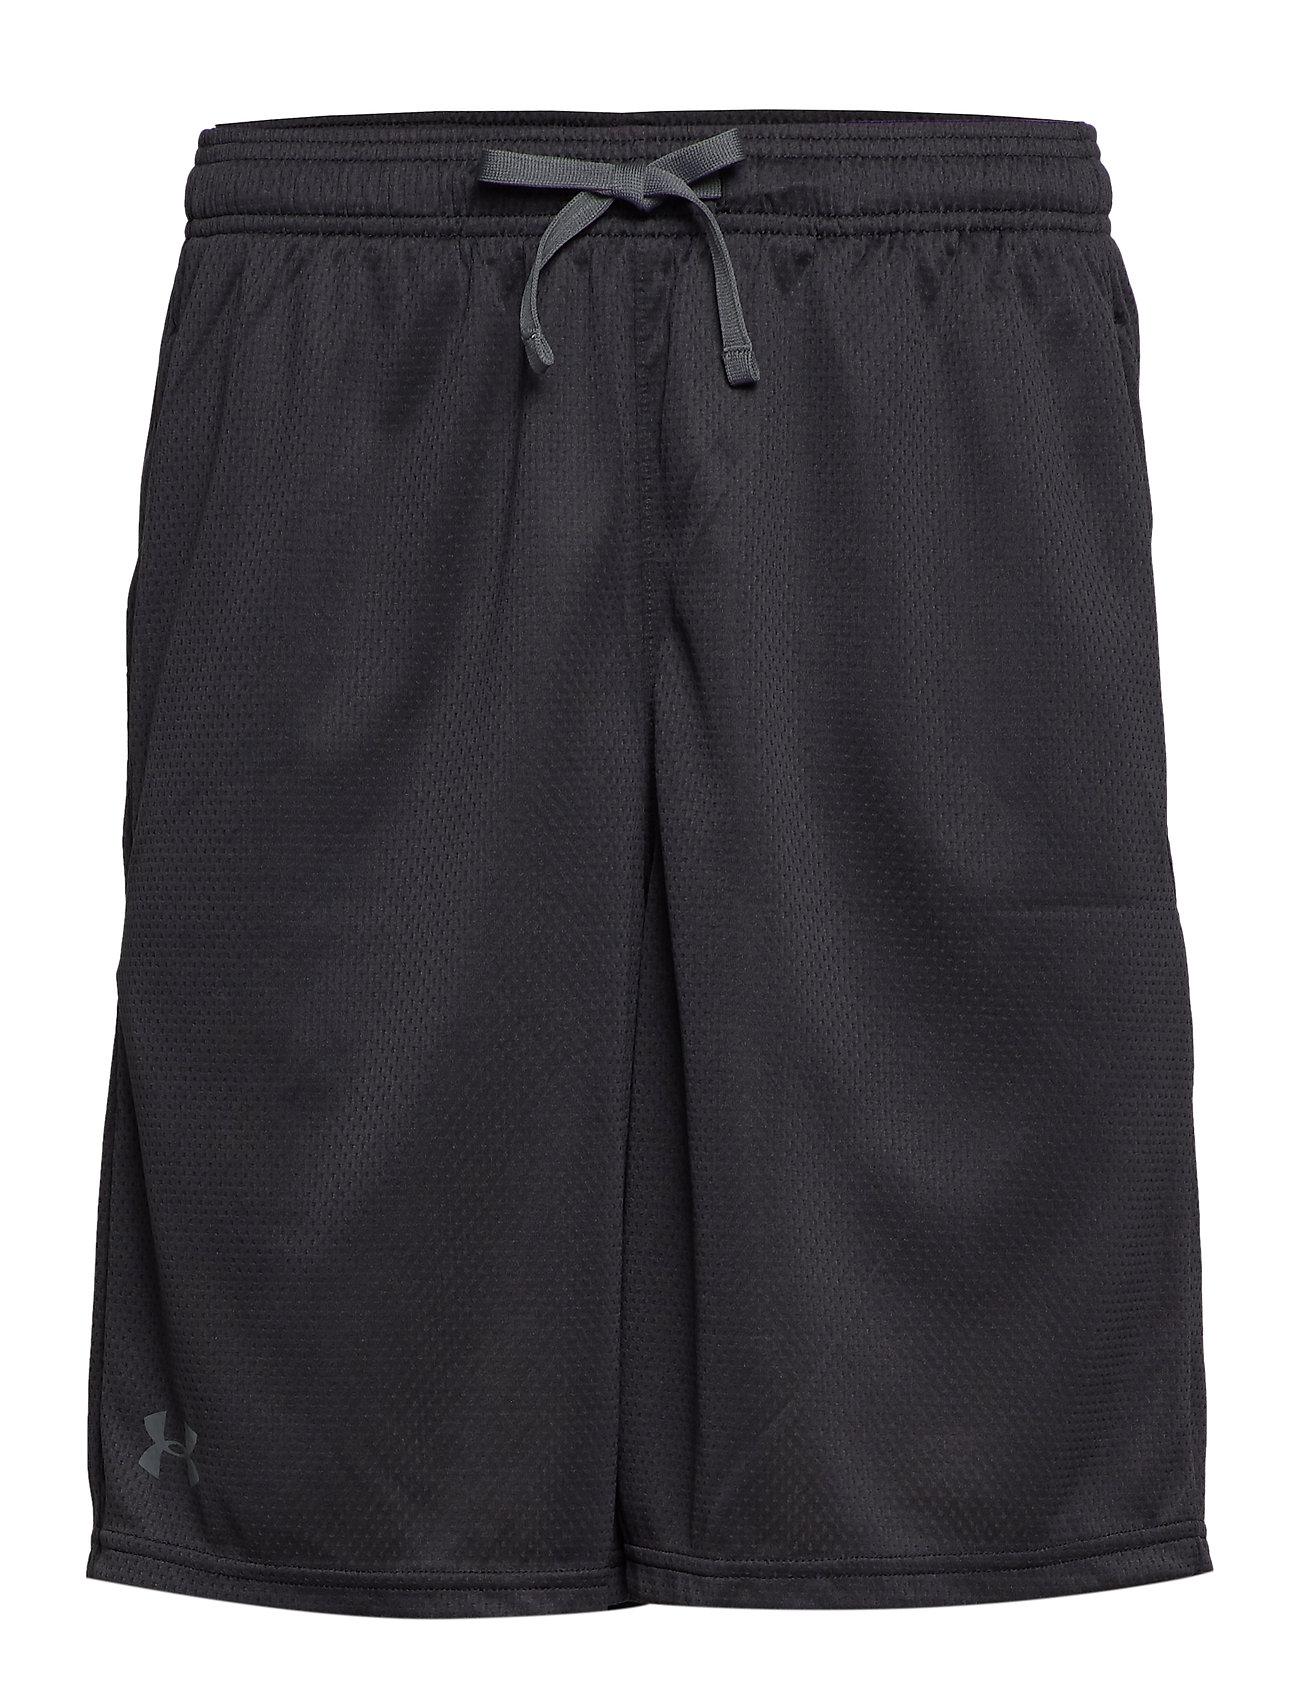 Under Armour UA Tech Mesh Shorts - BLACK